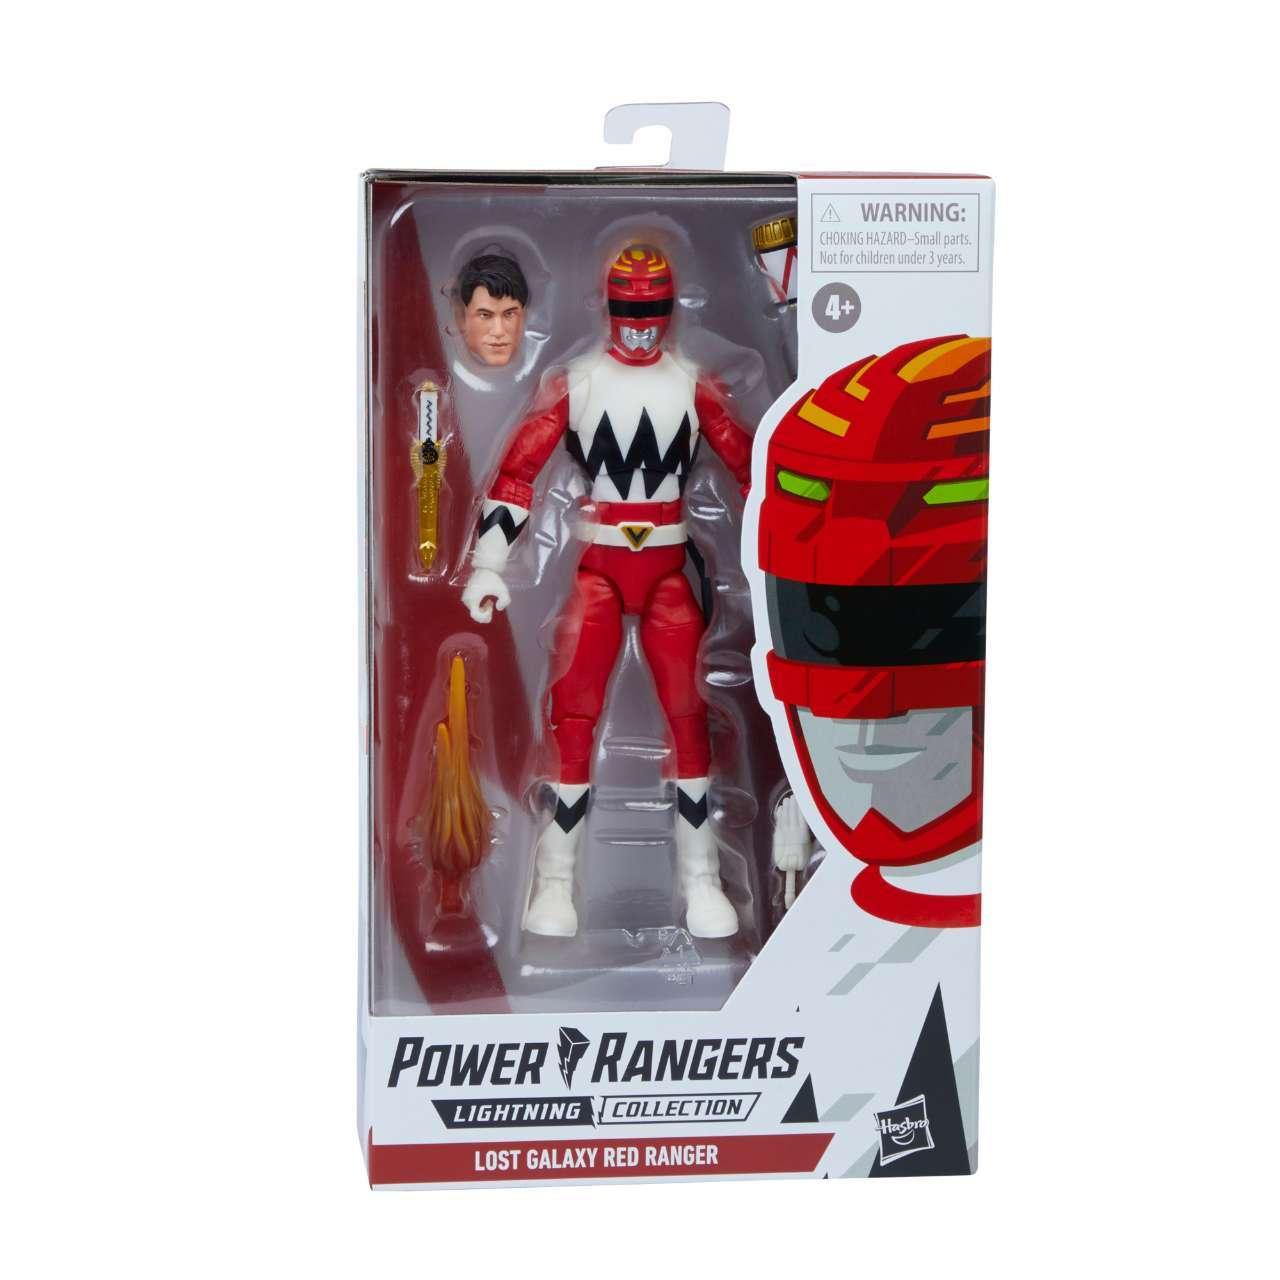 power-rangers-lightning-collection-F1429_PROD_PRG_BLT_LGY_JUPITER_62A5459_Online_300DPI copy 5